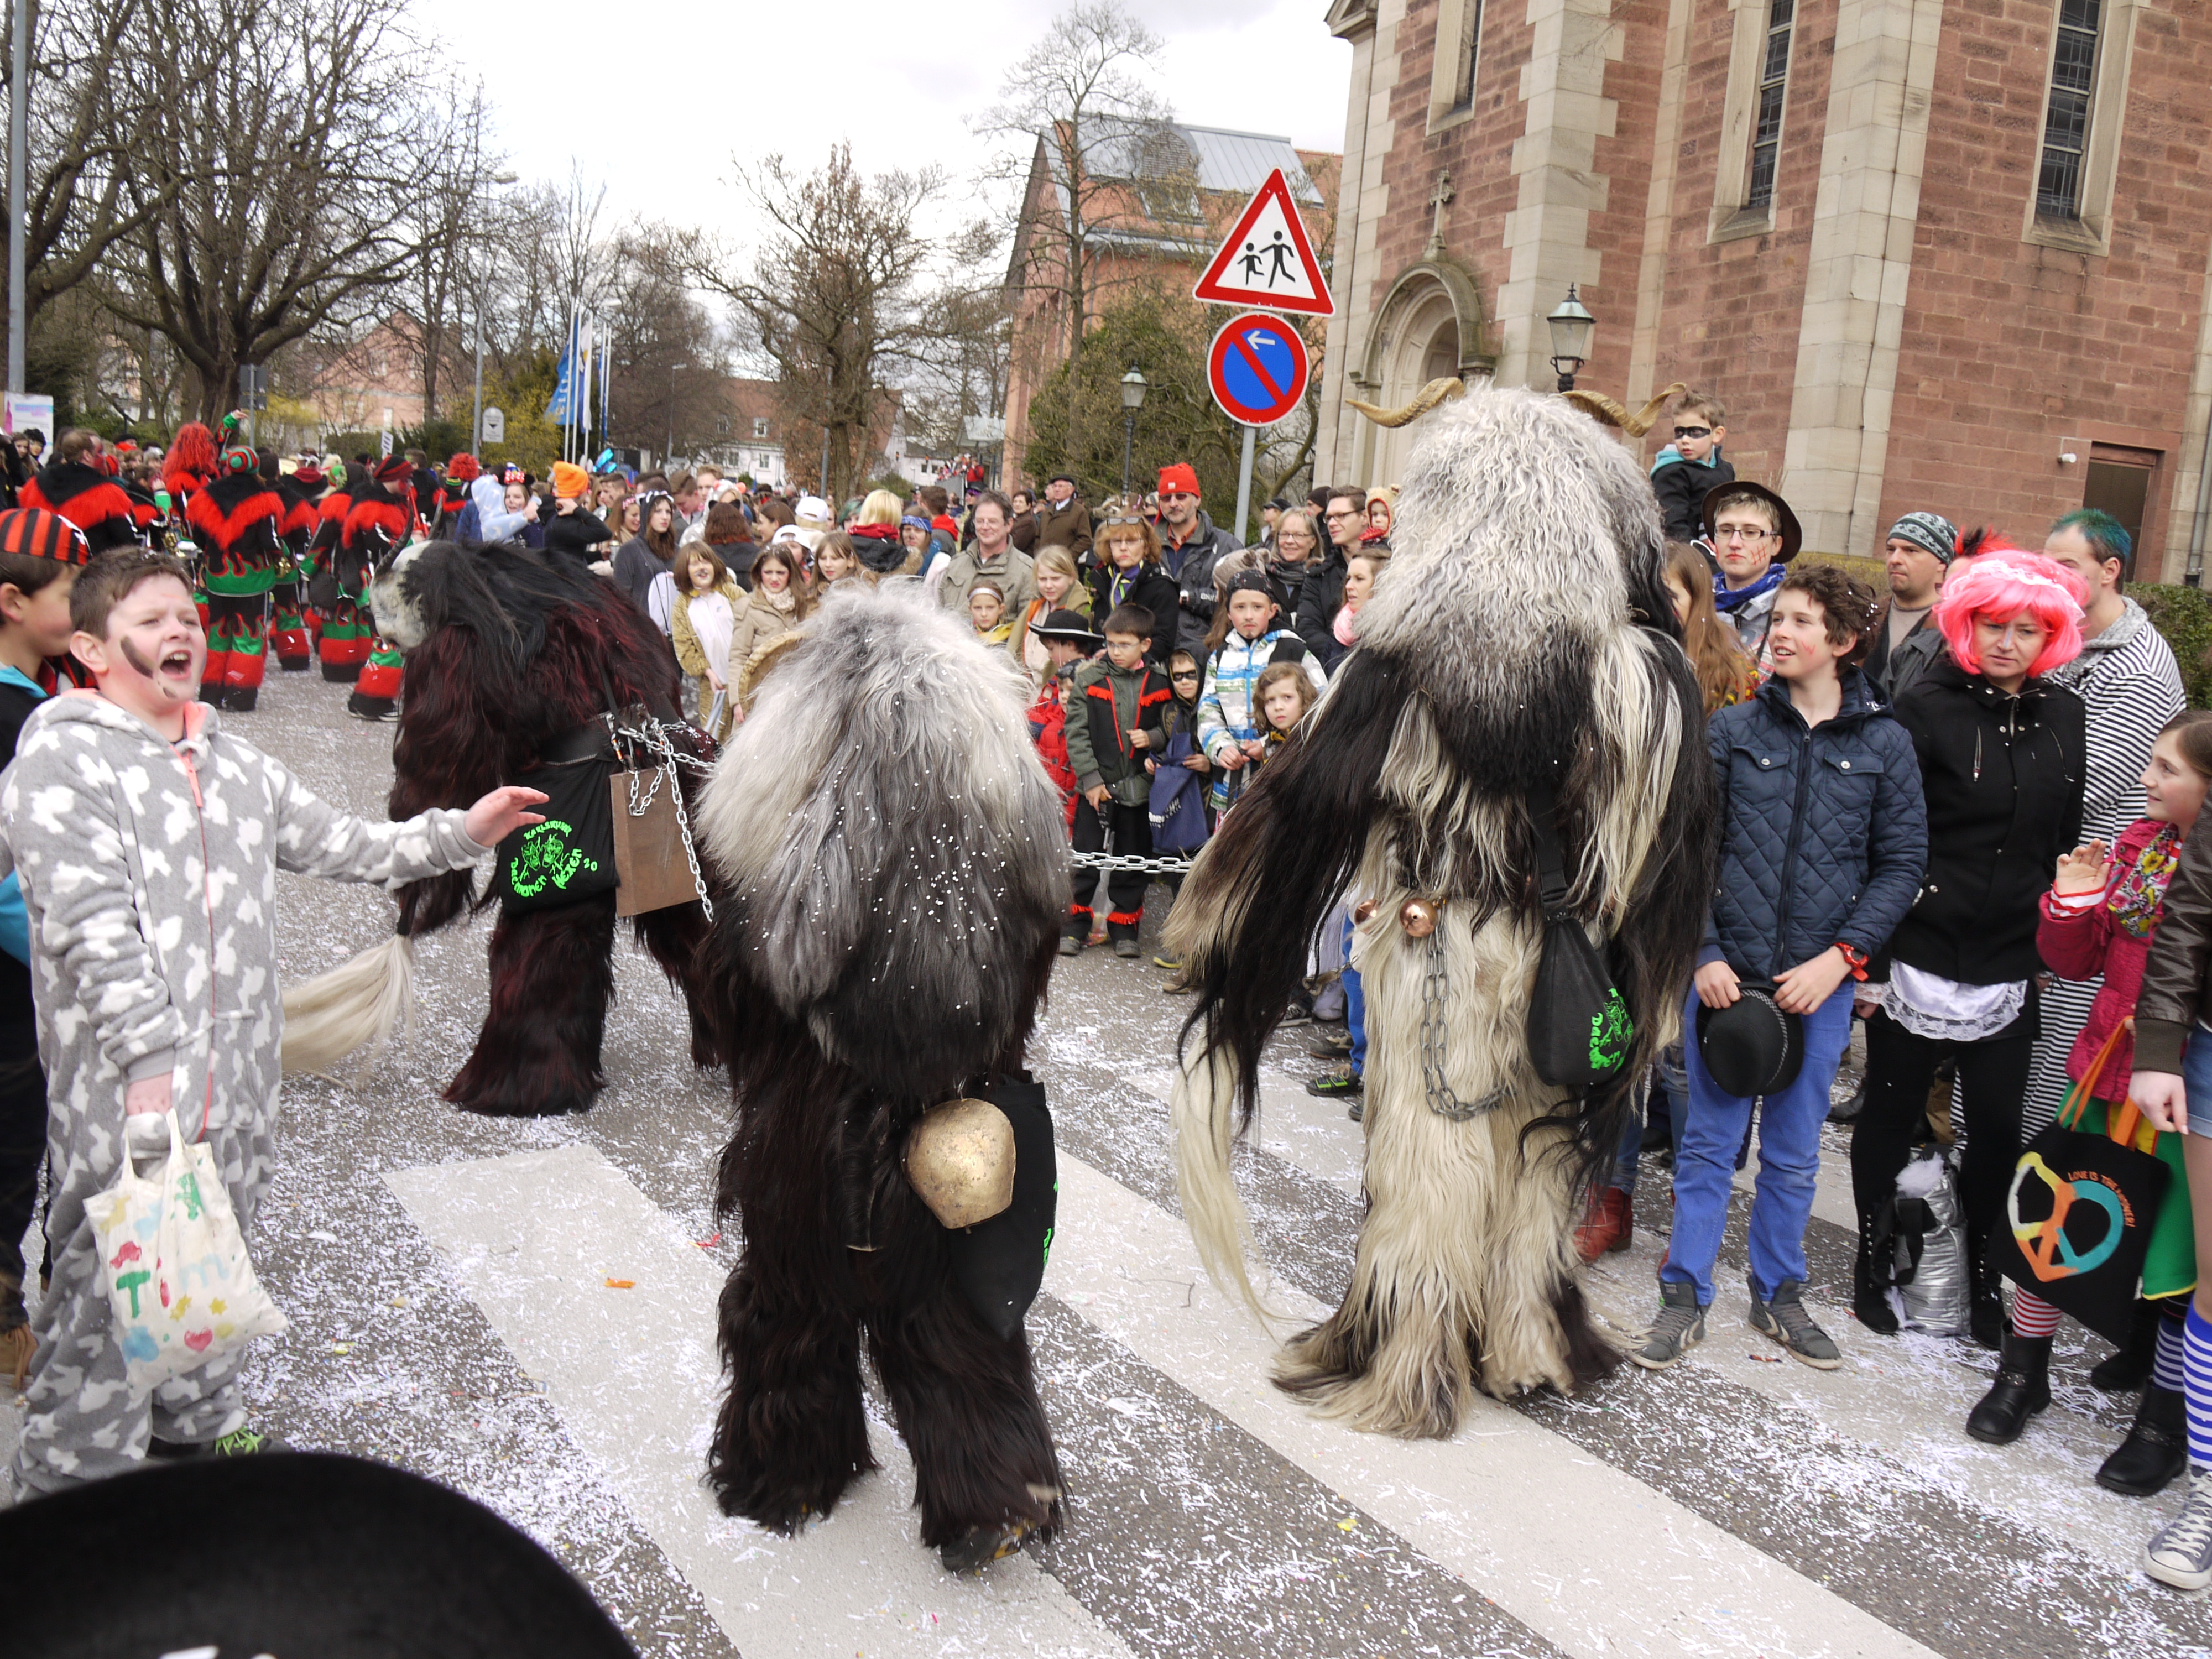 Fasching or Carnival street parade